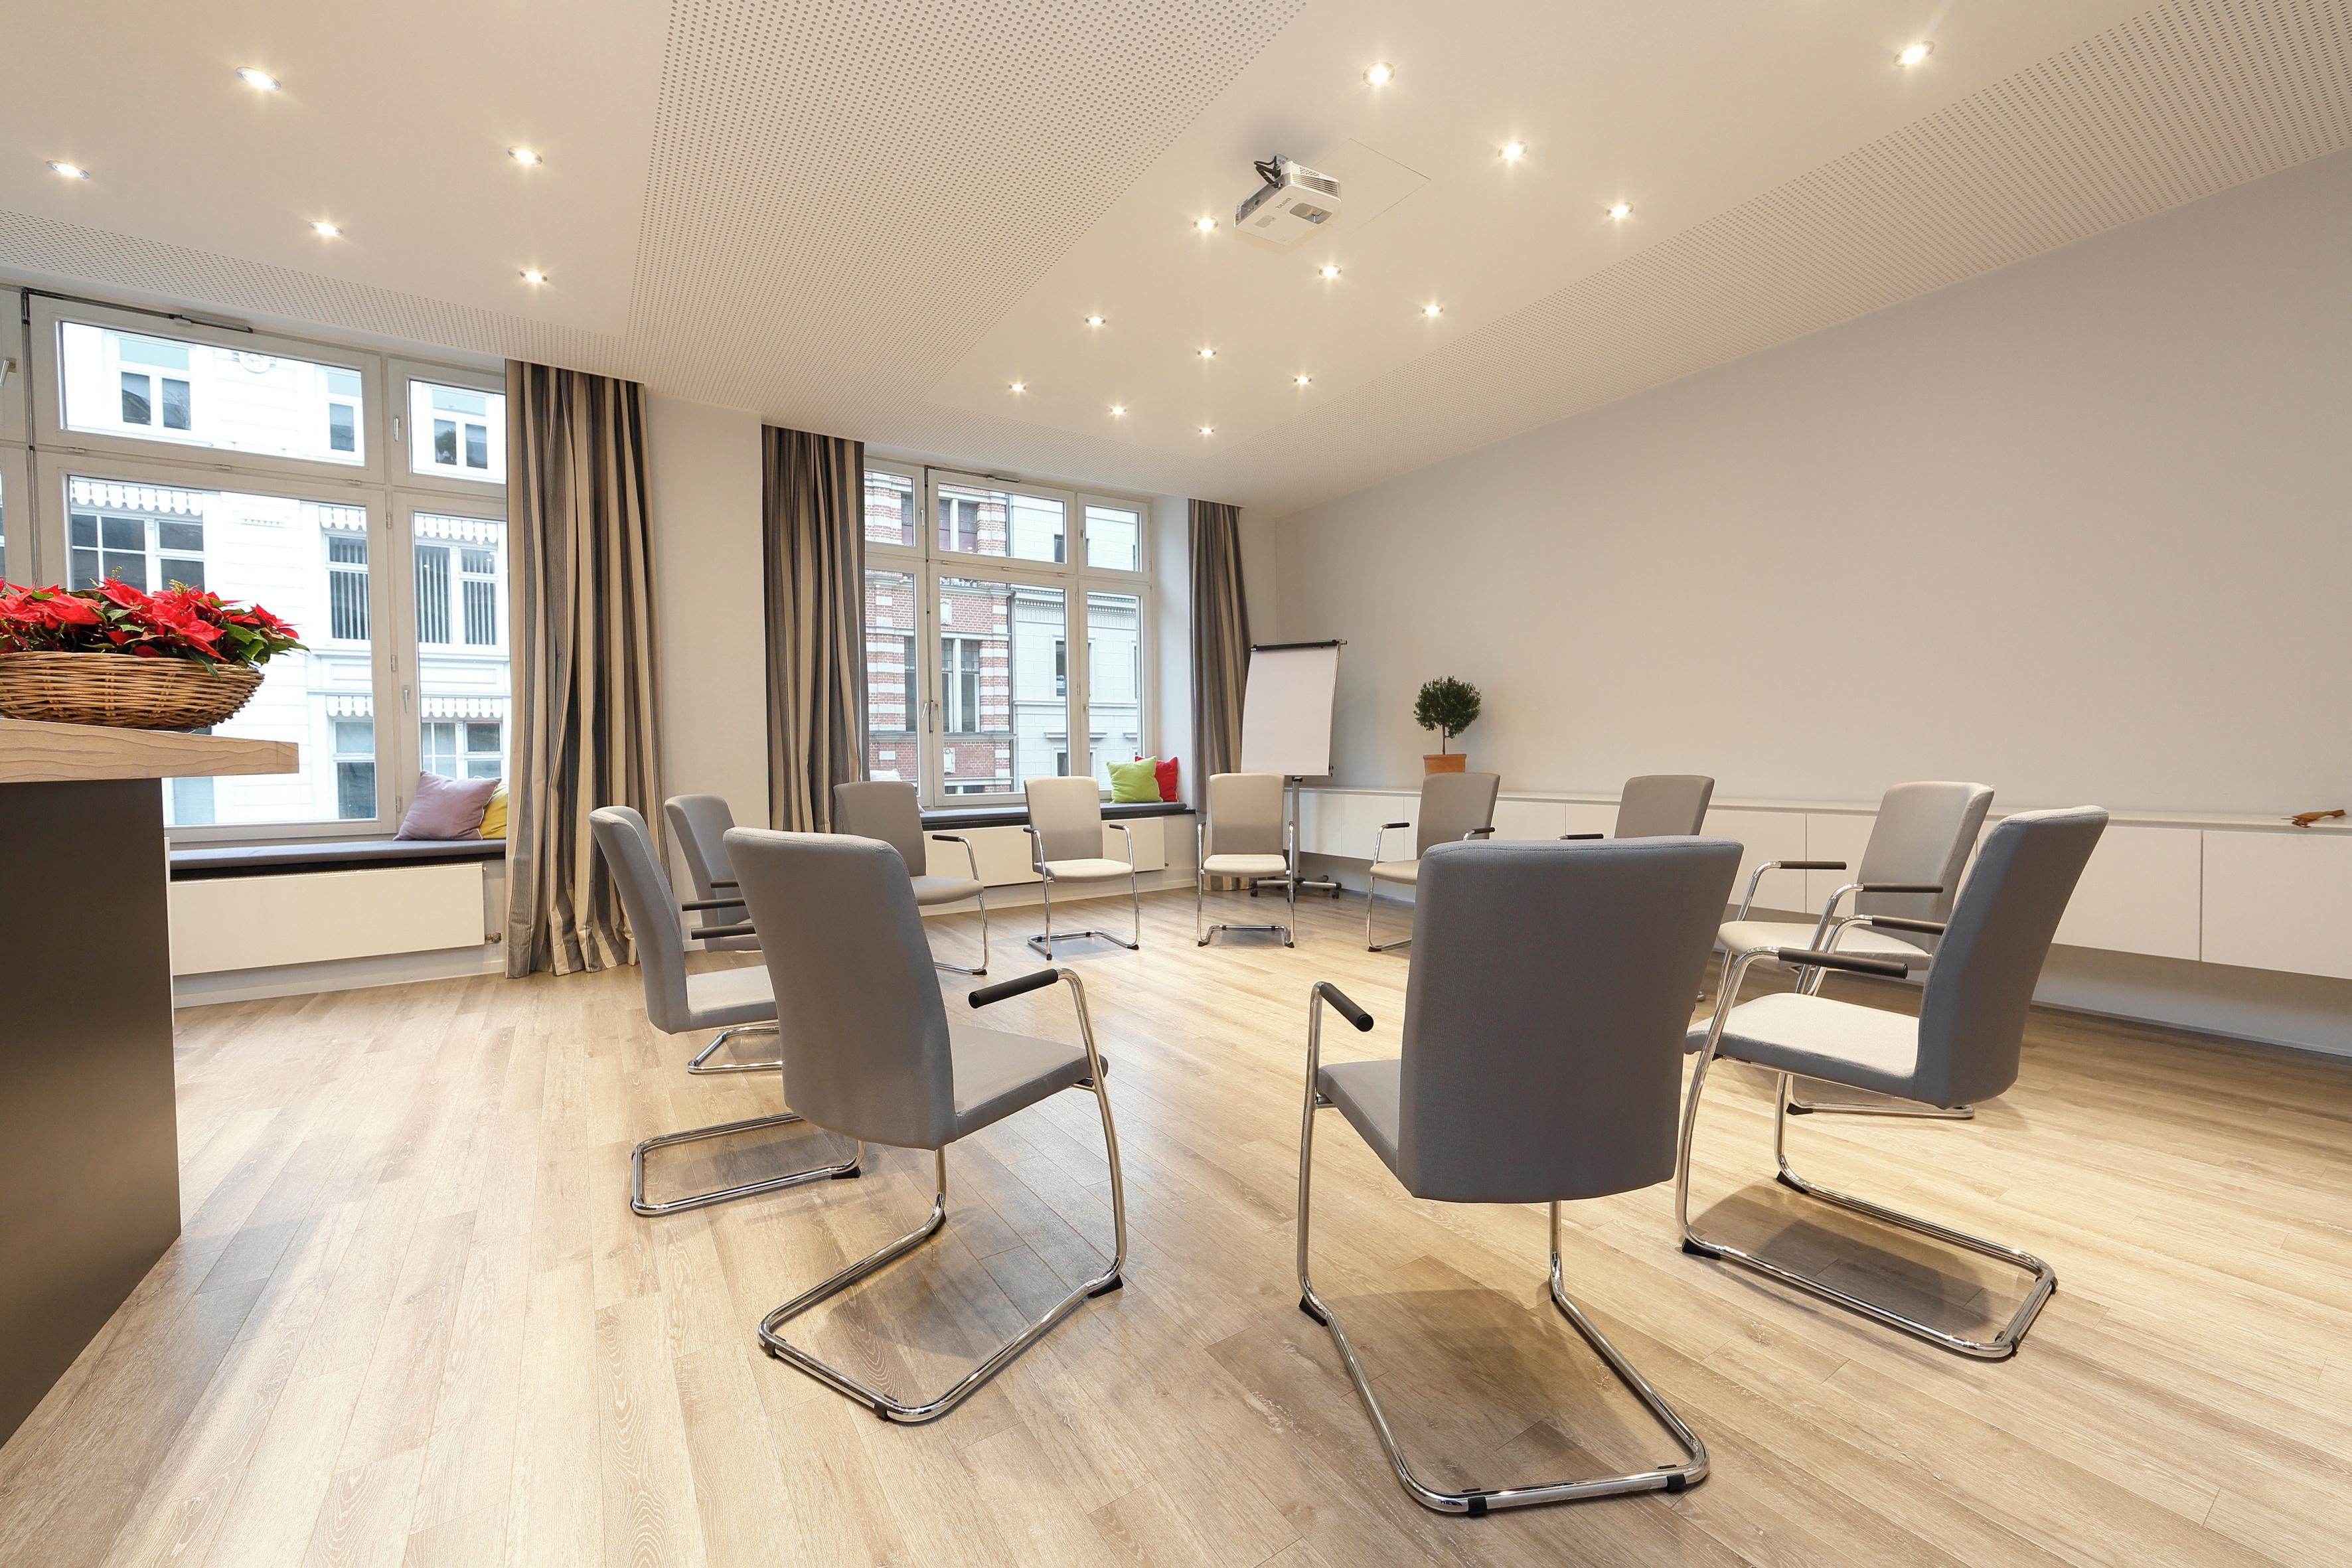 inplace personalmanagement gmbh raum hamburg mieten in hamburg. Black Bedroom Furniture Sets. Home Design Ideas